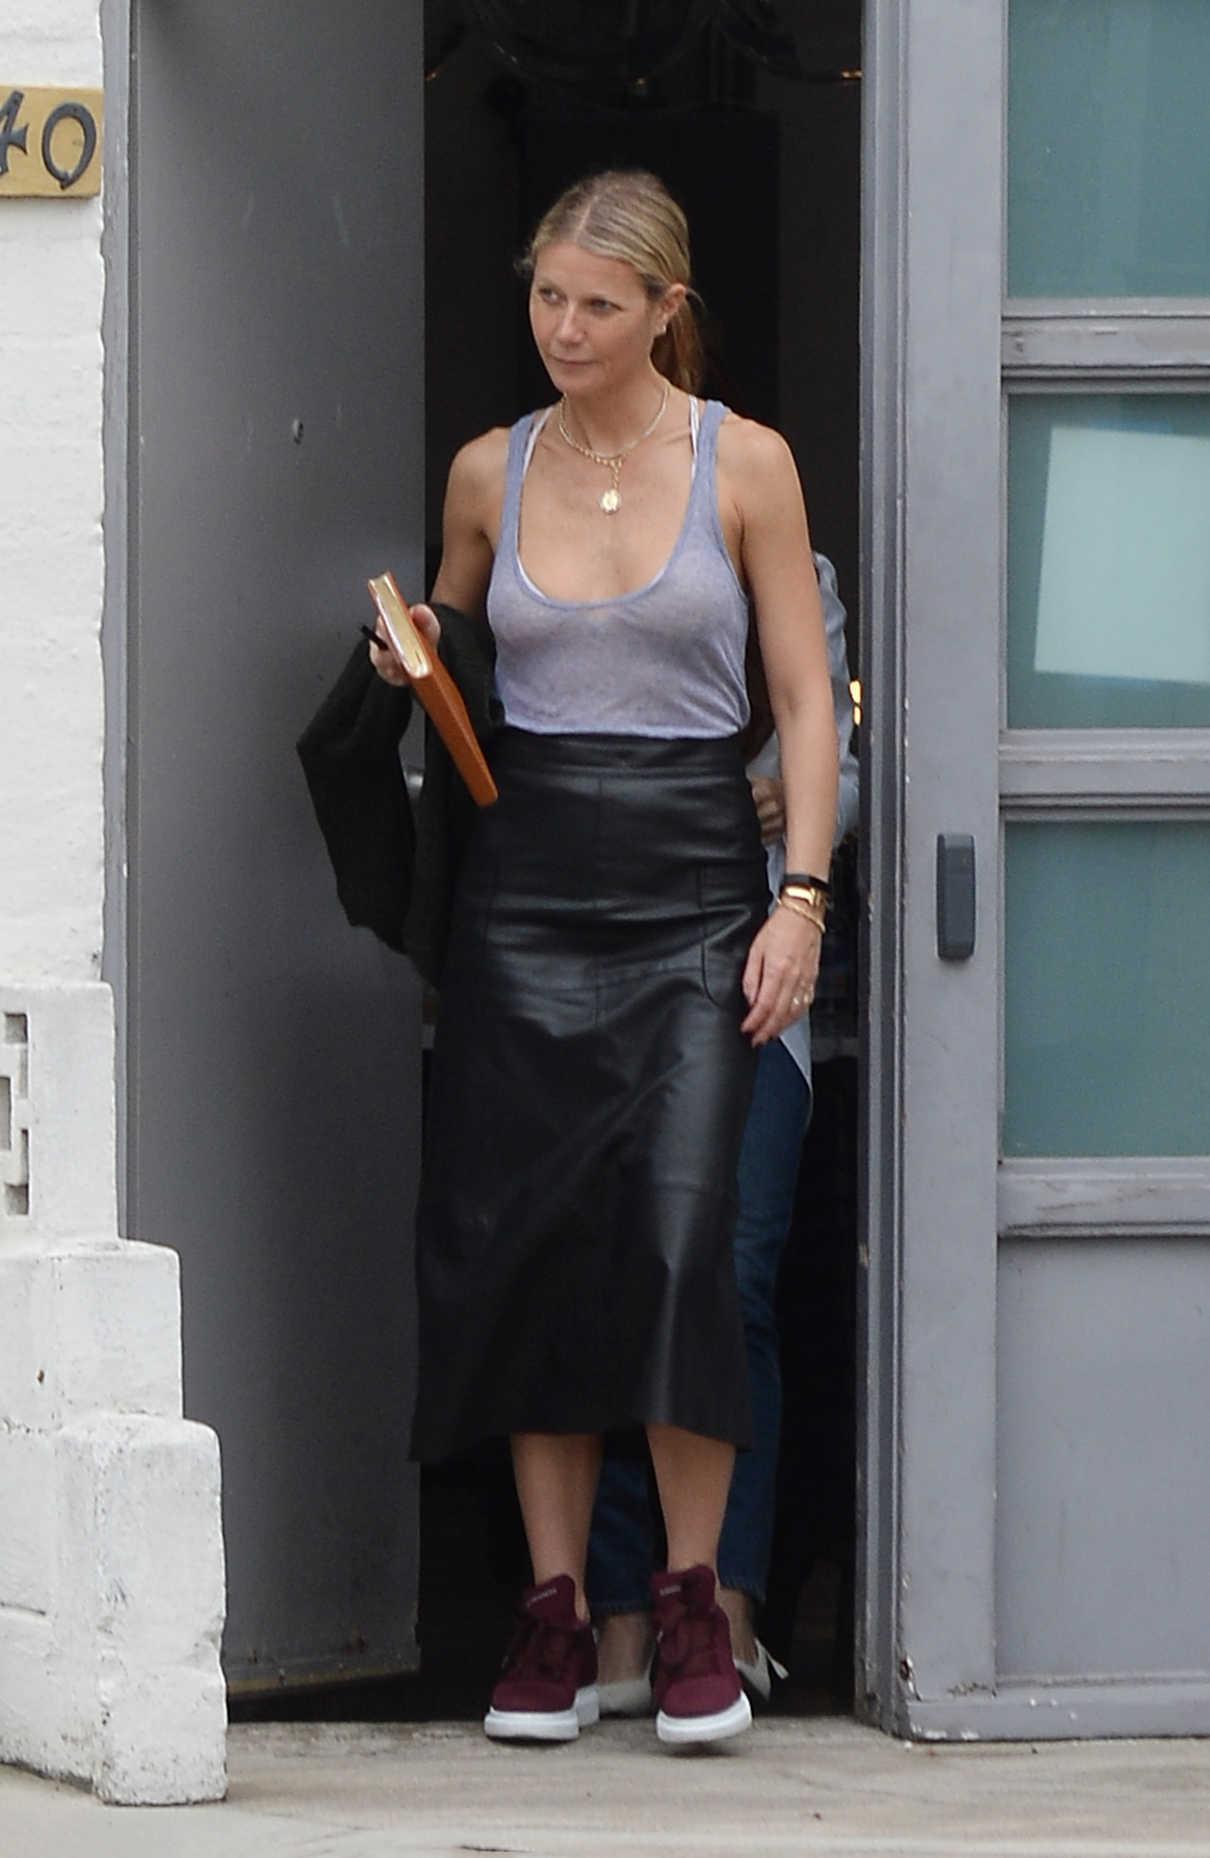 Gwyneth Paltrow in a Gray Tank Top